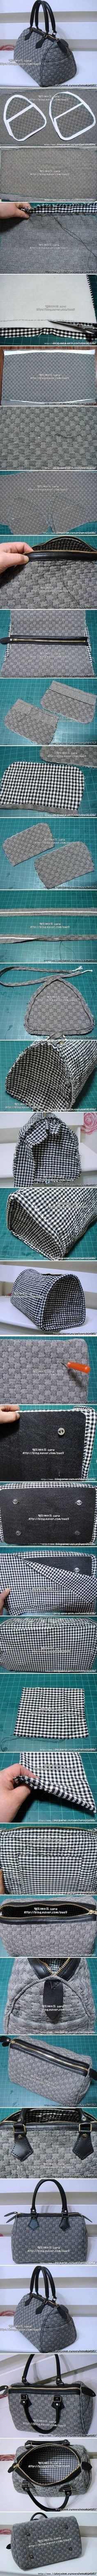 DIY Nice Fashionable Handbag